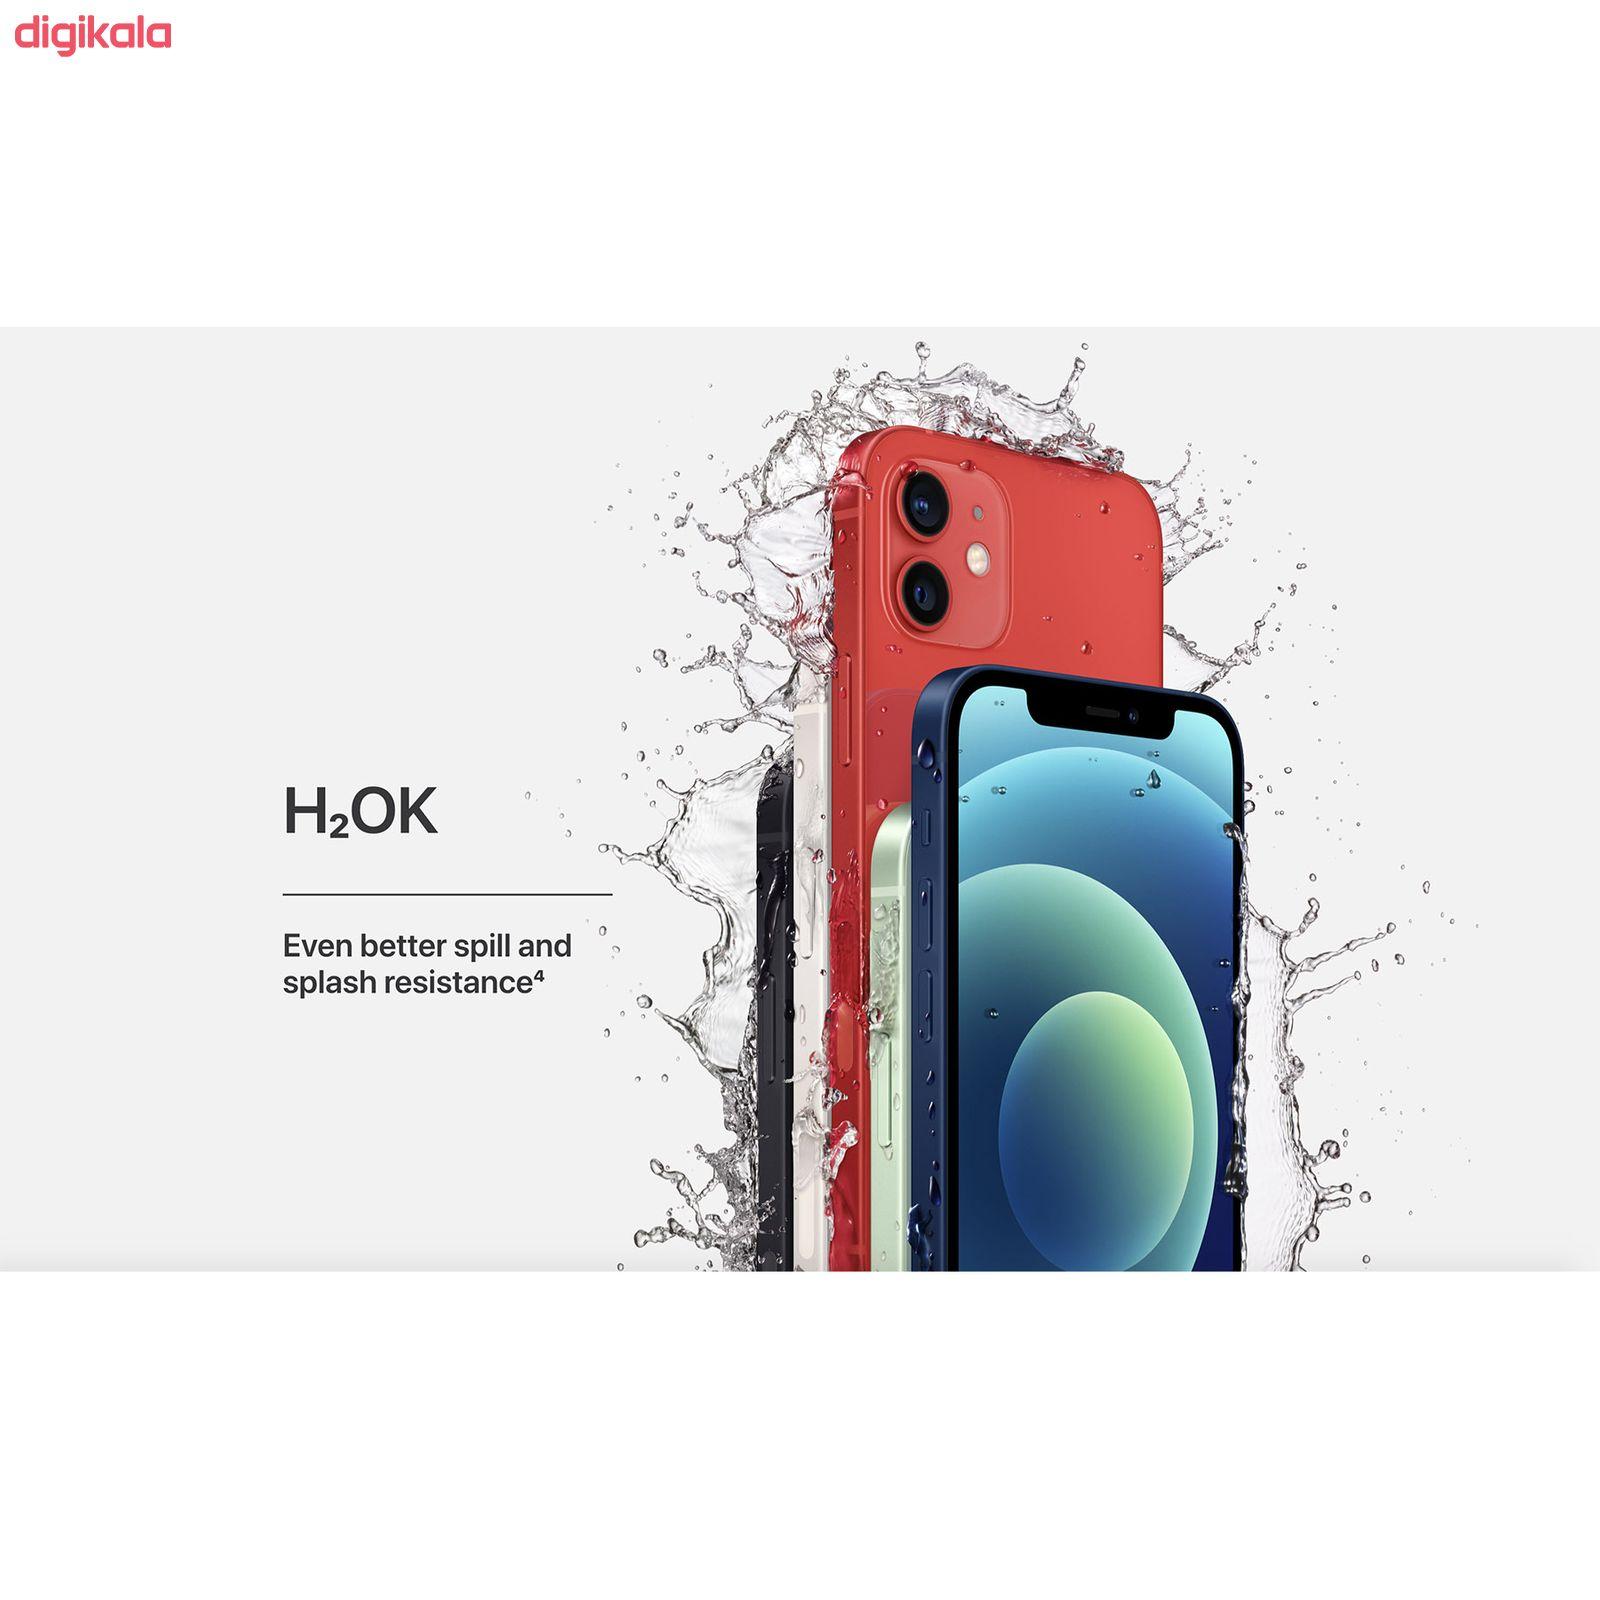 گوشی موبایل اپل مدل iPhone 12 A2404 دو سیم کارت ظرفیت 128 گیگابایت  main 1 12